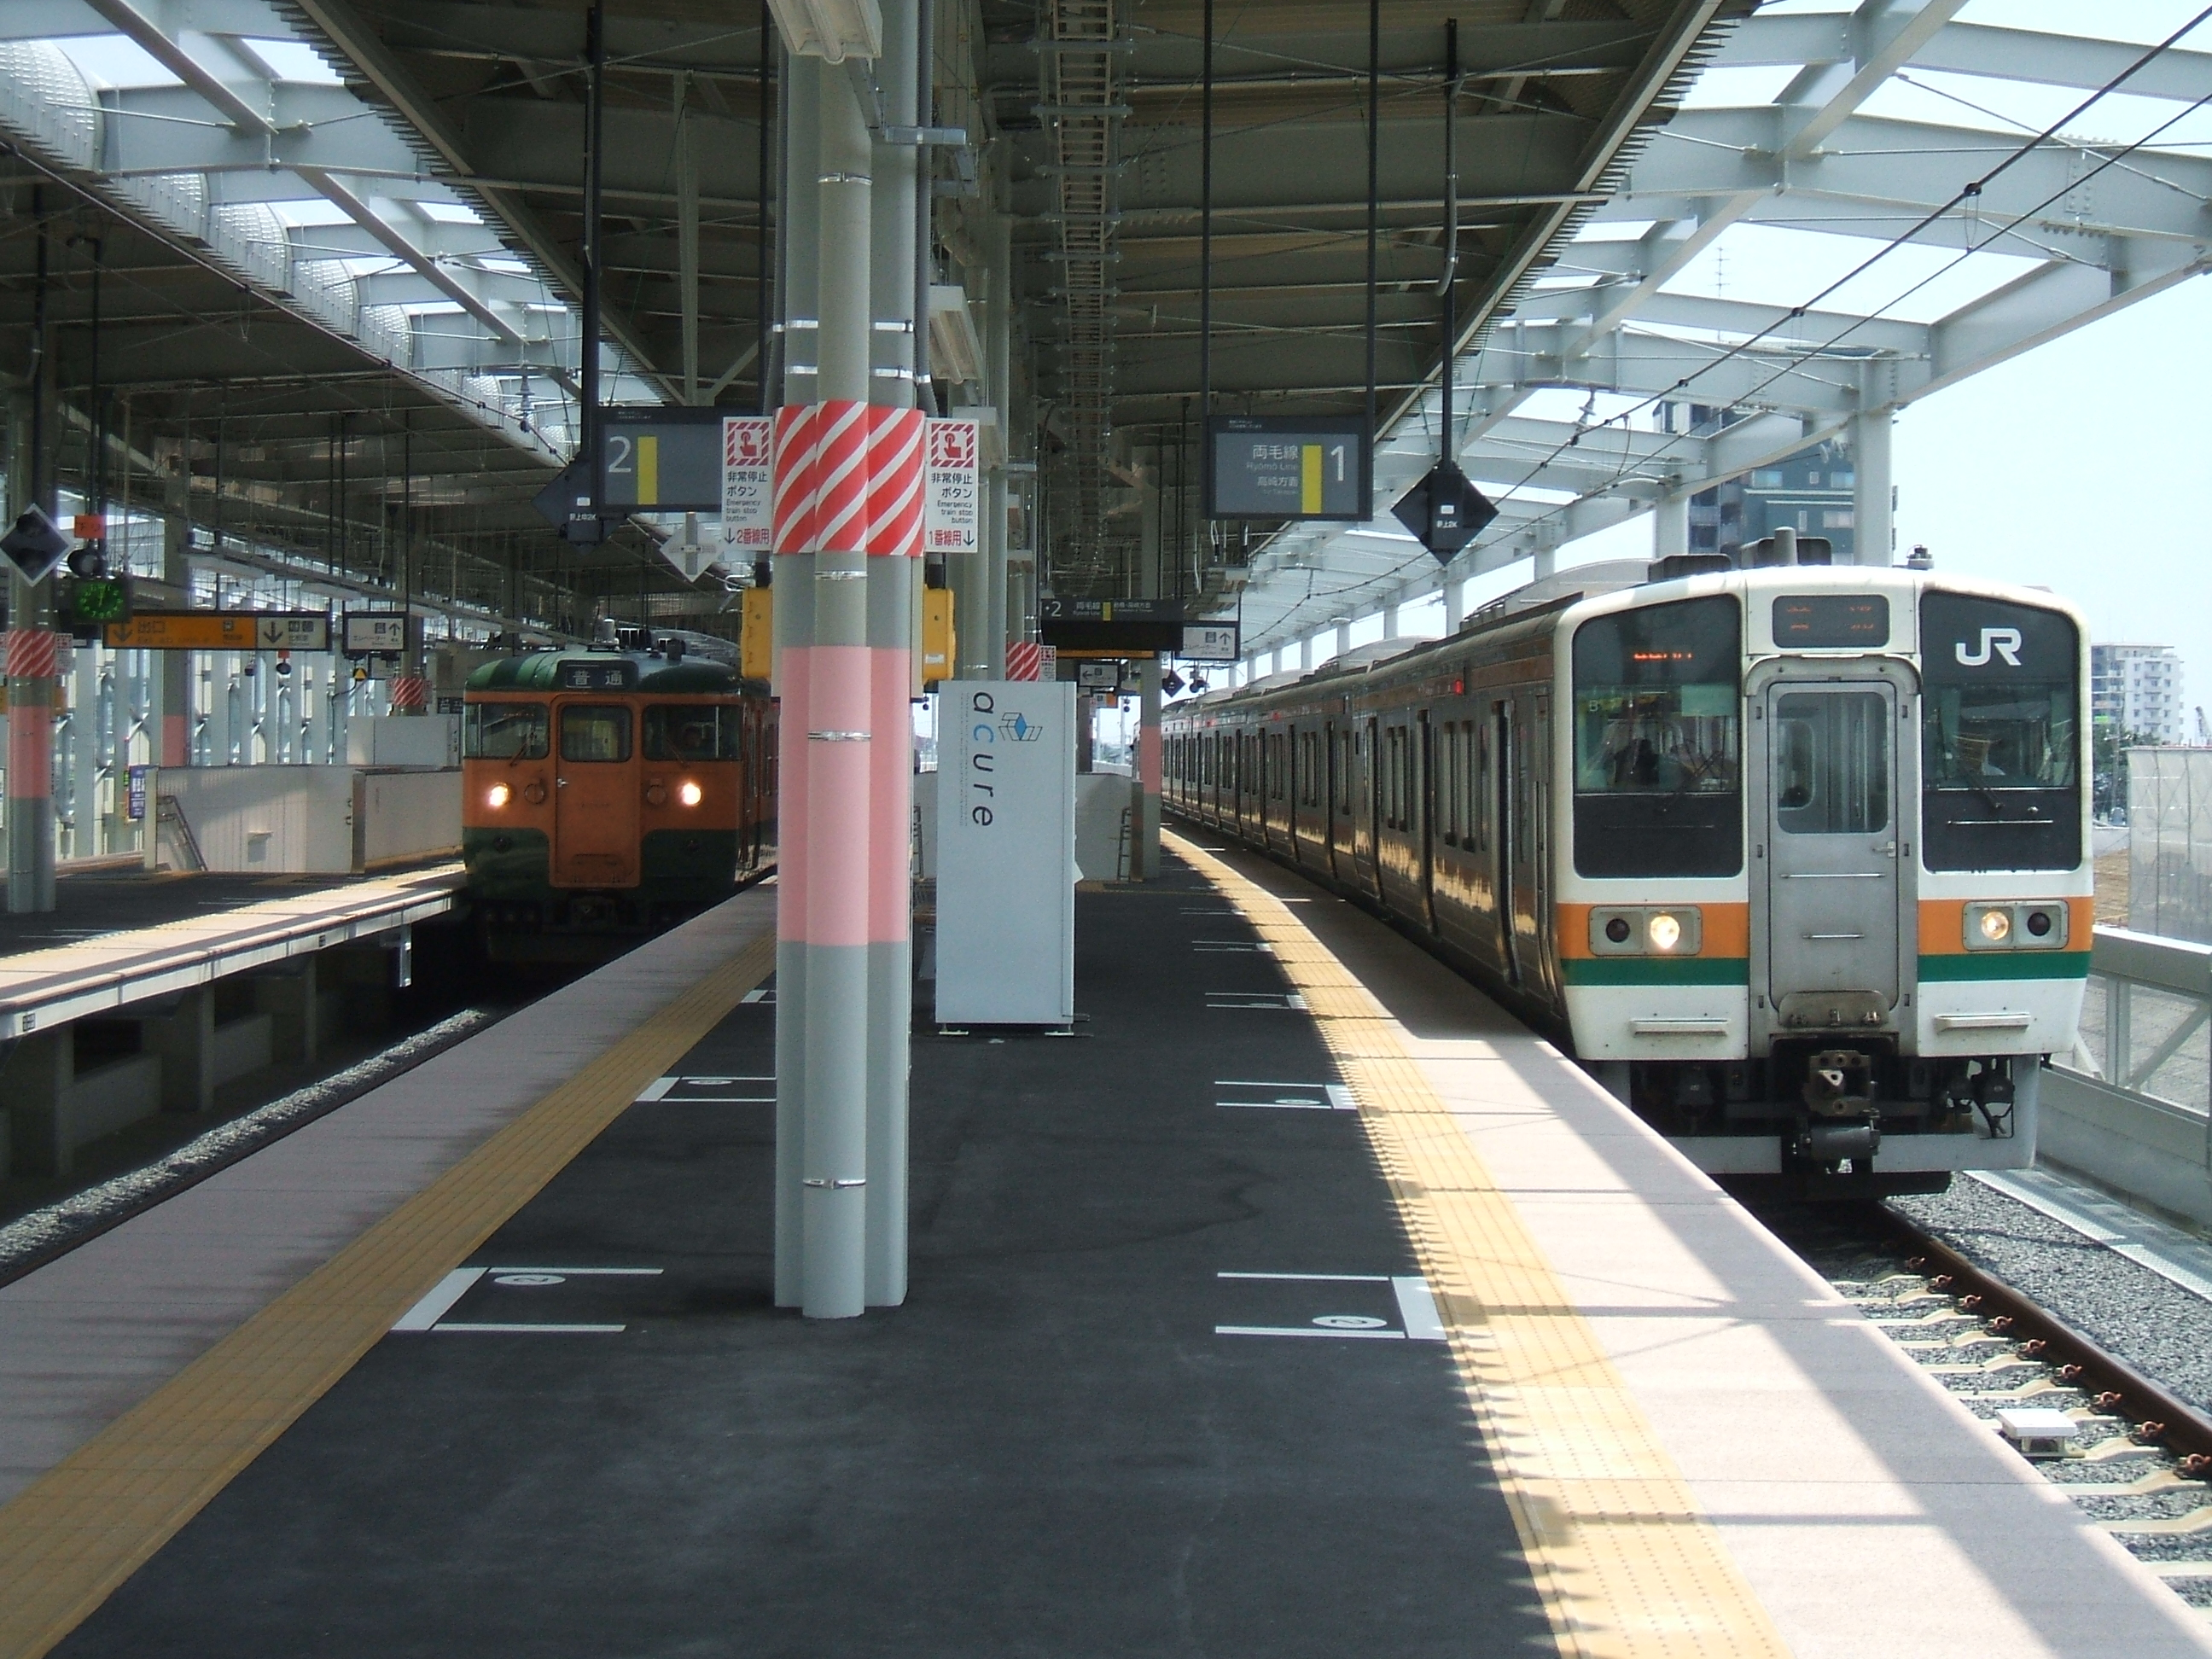 https://upload.wikimedia.org/wikipedia/commons/a/ad/JNR_115_Series_and_JNR_211_Series_at_Isesaki.jpg